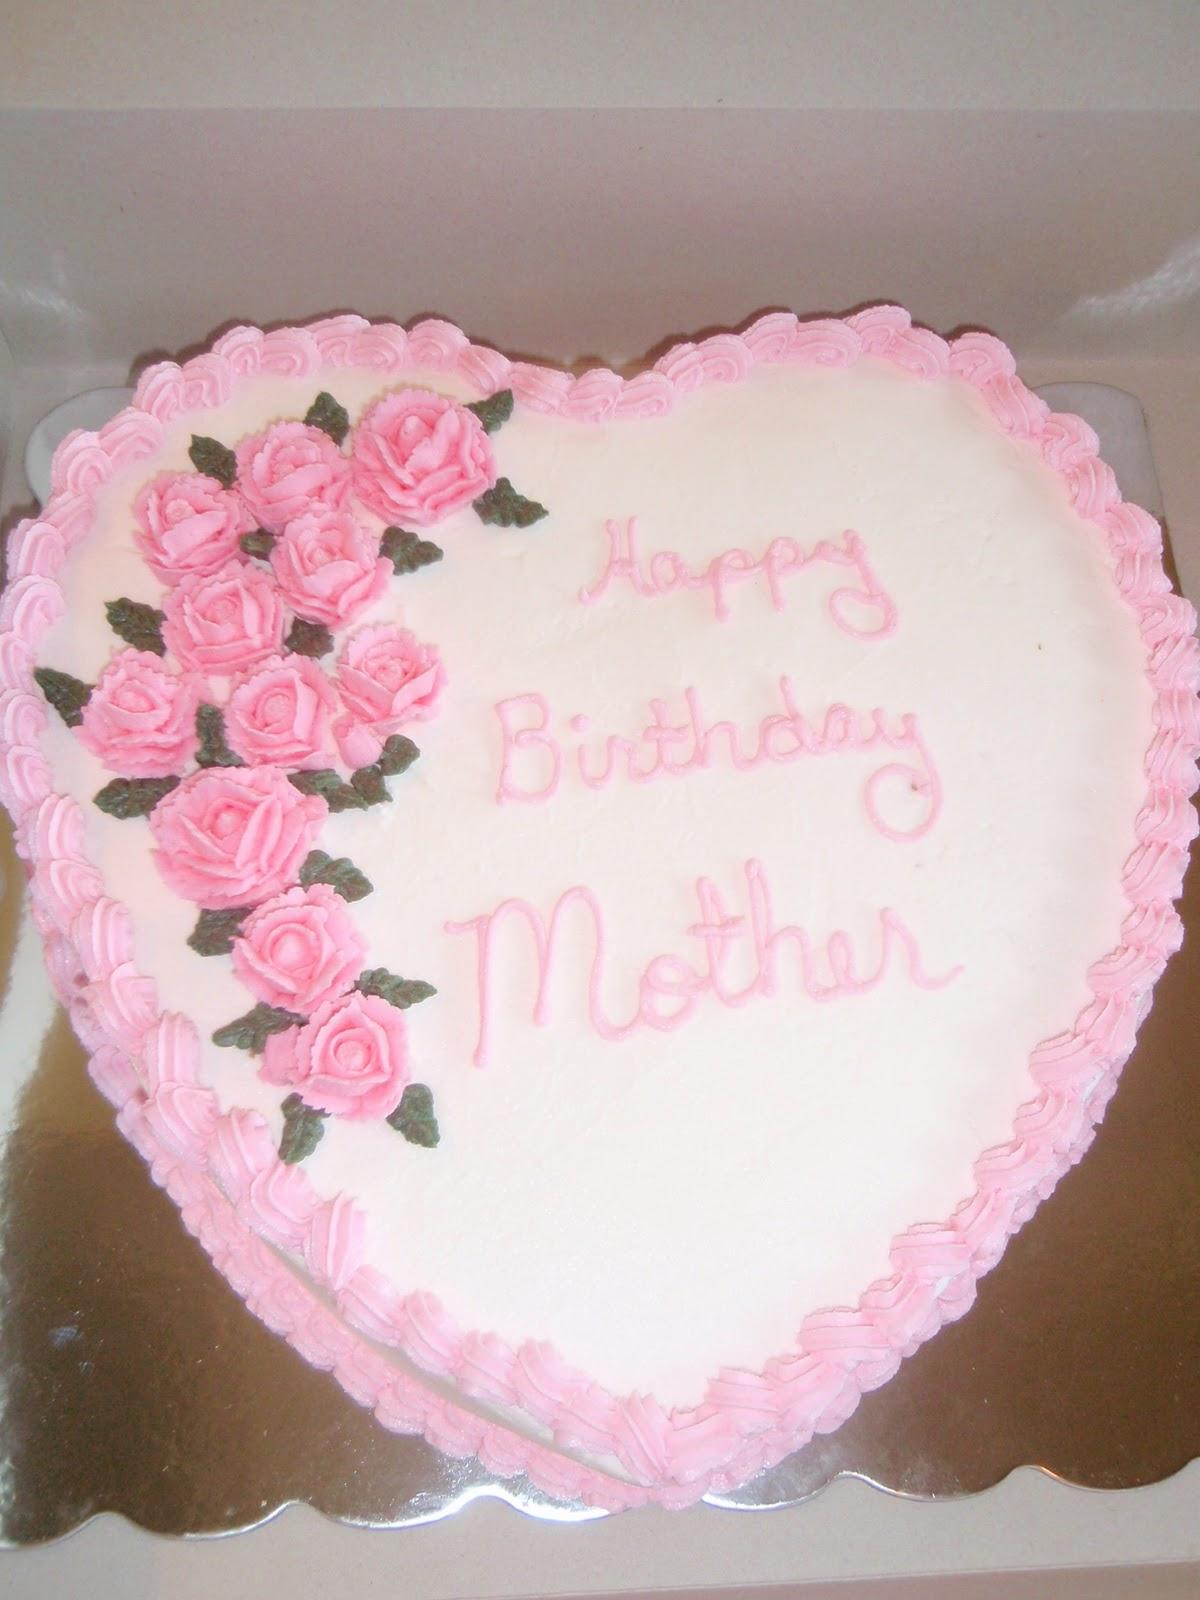 January Birthday Cakes Totsies More